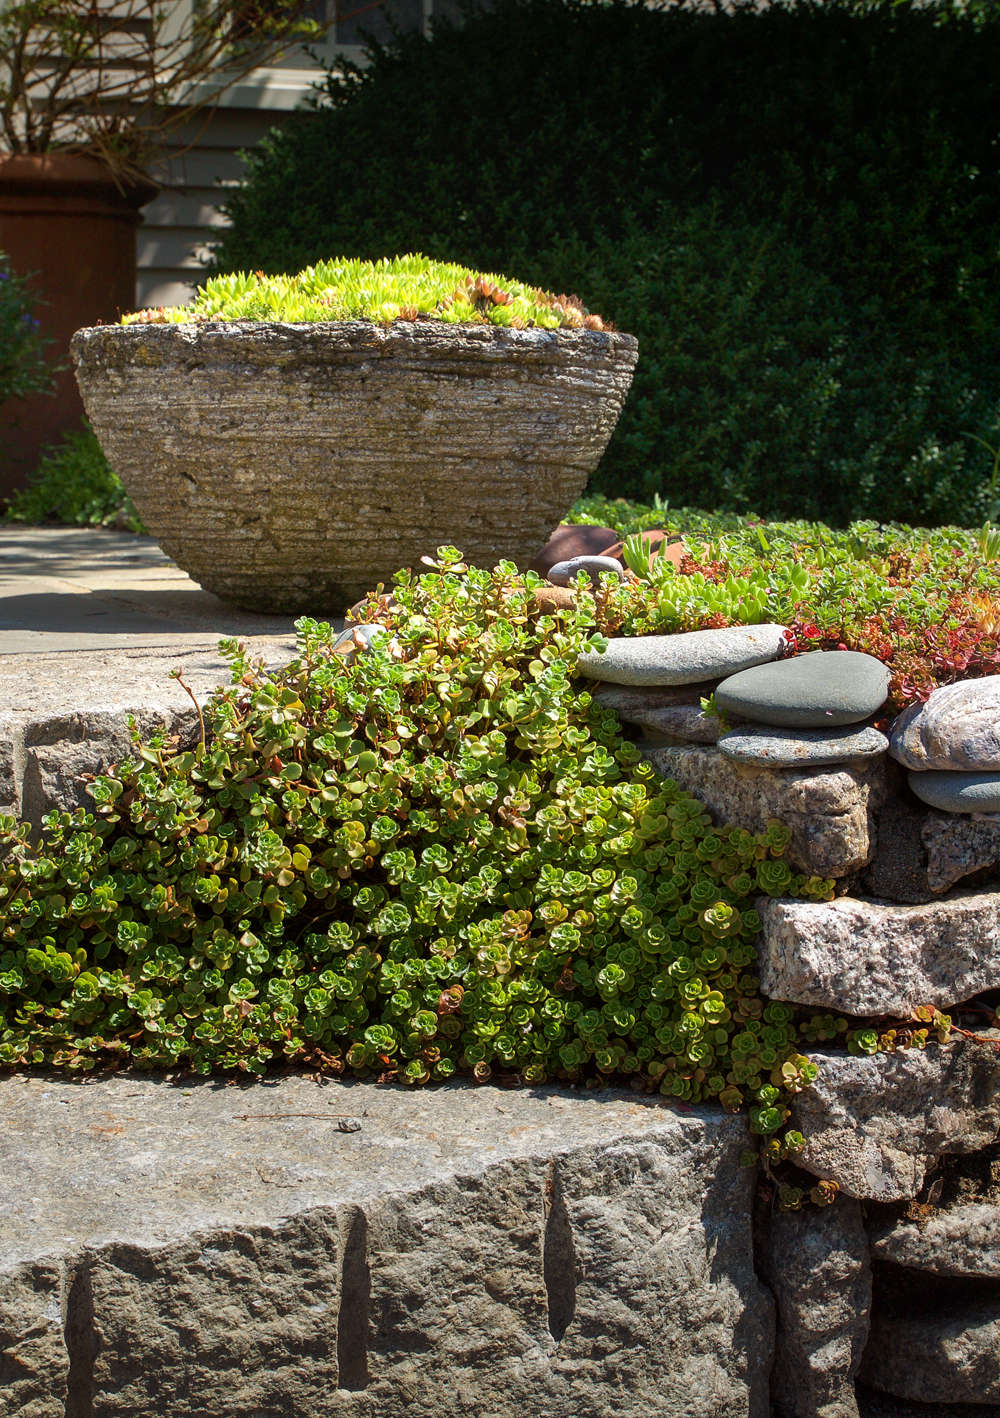 10 Garden Ideas to Steal from Provincetown on Cape Cod - Gardenista